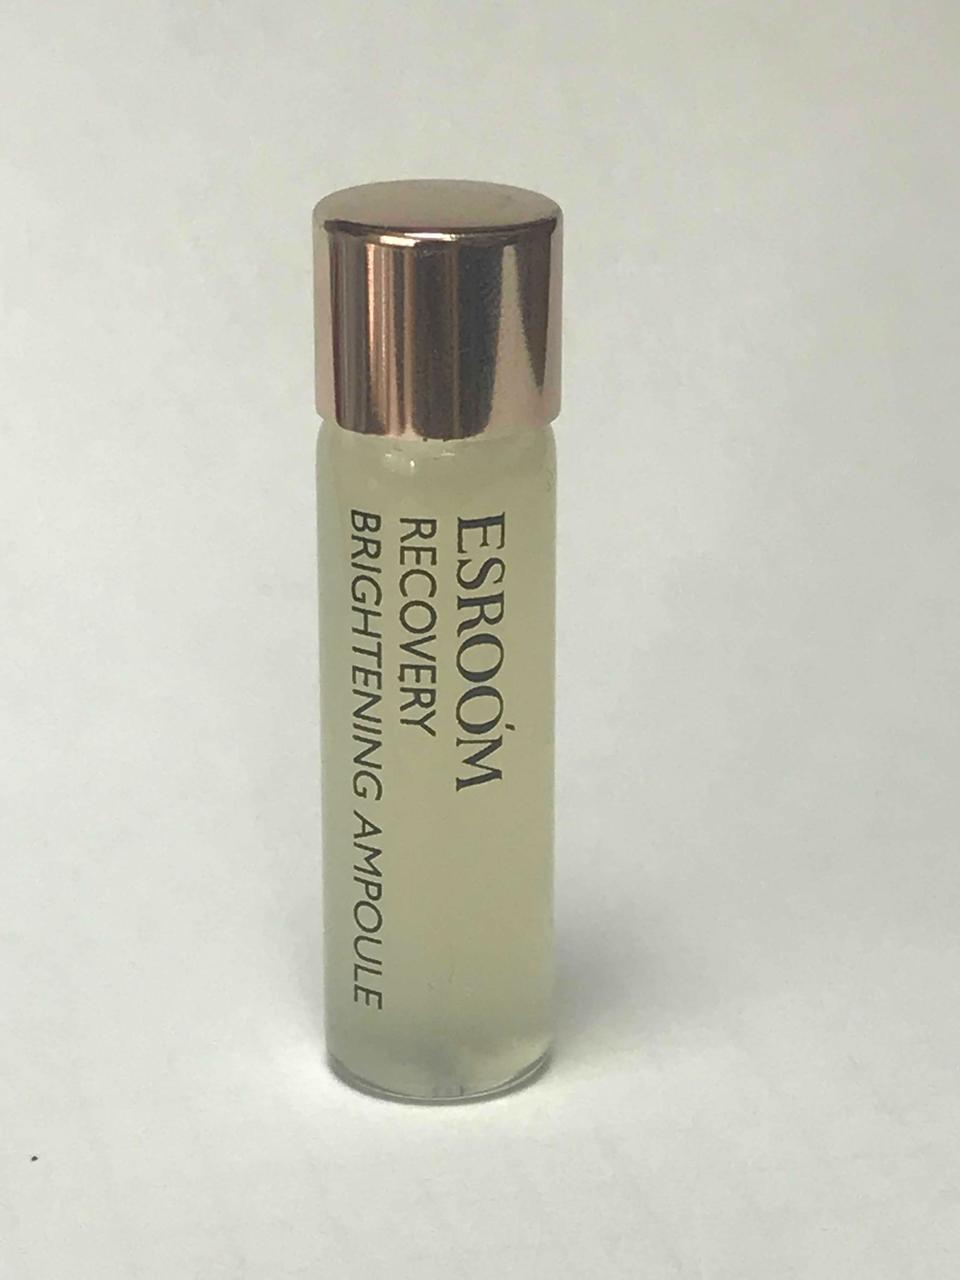 Ампула восстанавливающая регенеративная Esroom Regenerating Ampoule (Anti-wrinkle product) 2.5мл